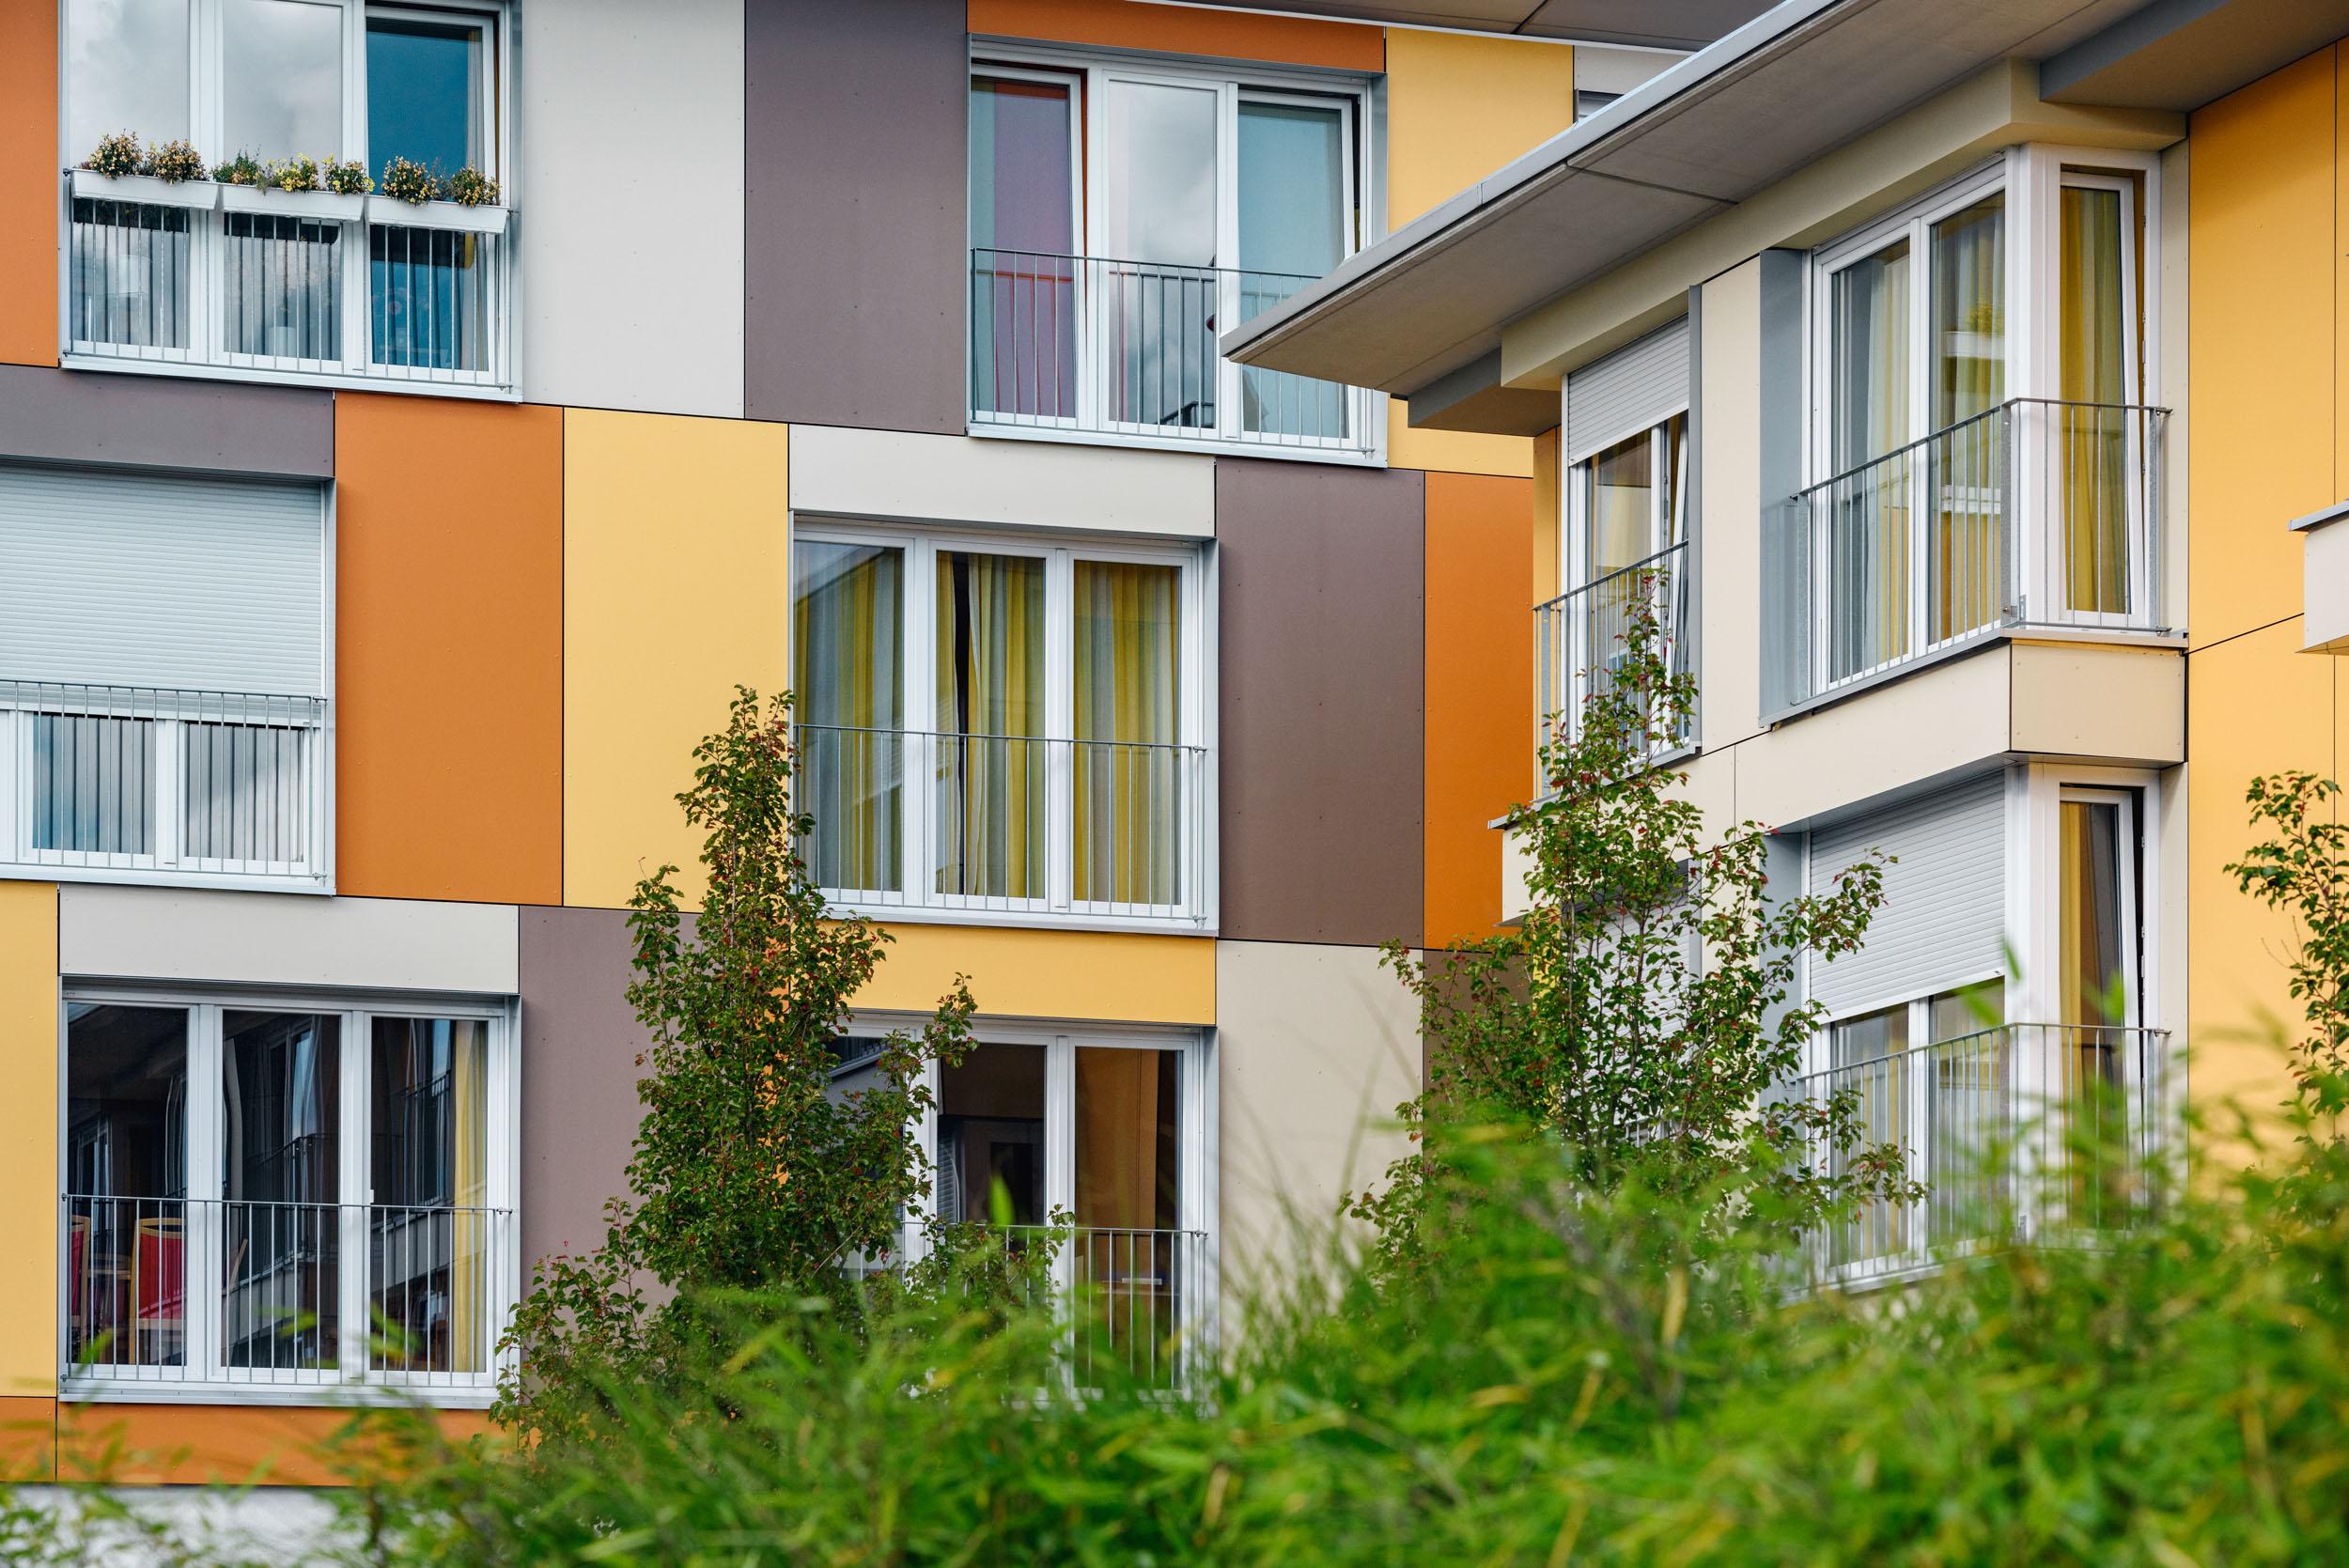 Gustav-Epple-Bauunternehmung-Gesundheit-Pflege-Waldau-StuttgartWaldau_MLX7734#00